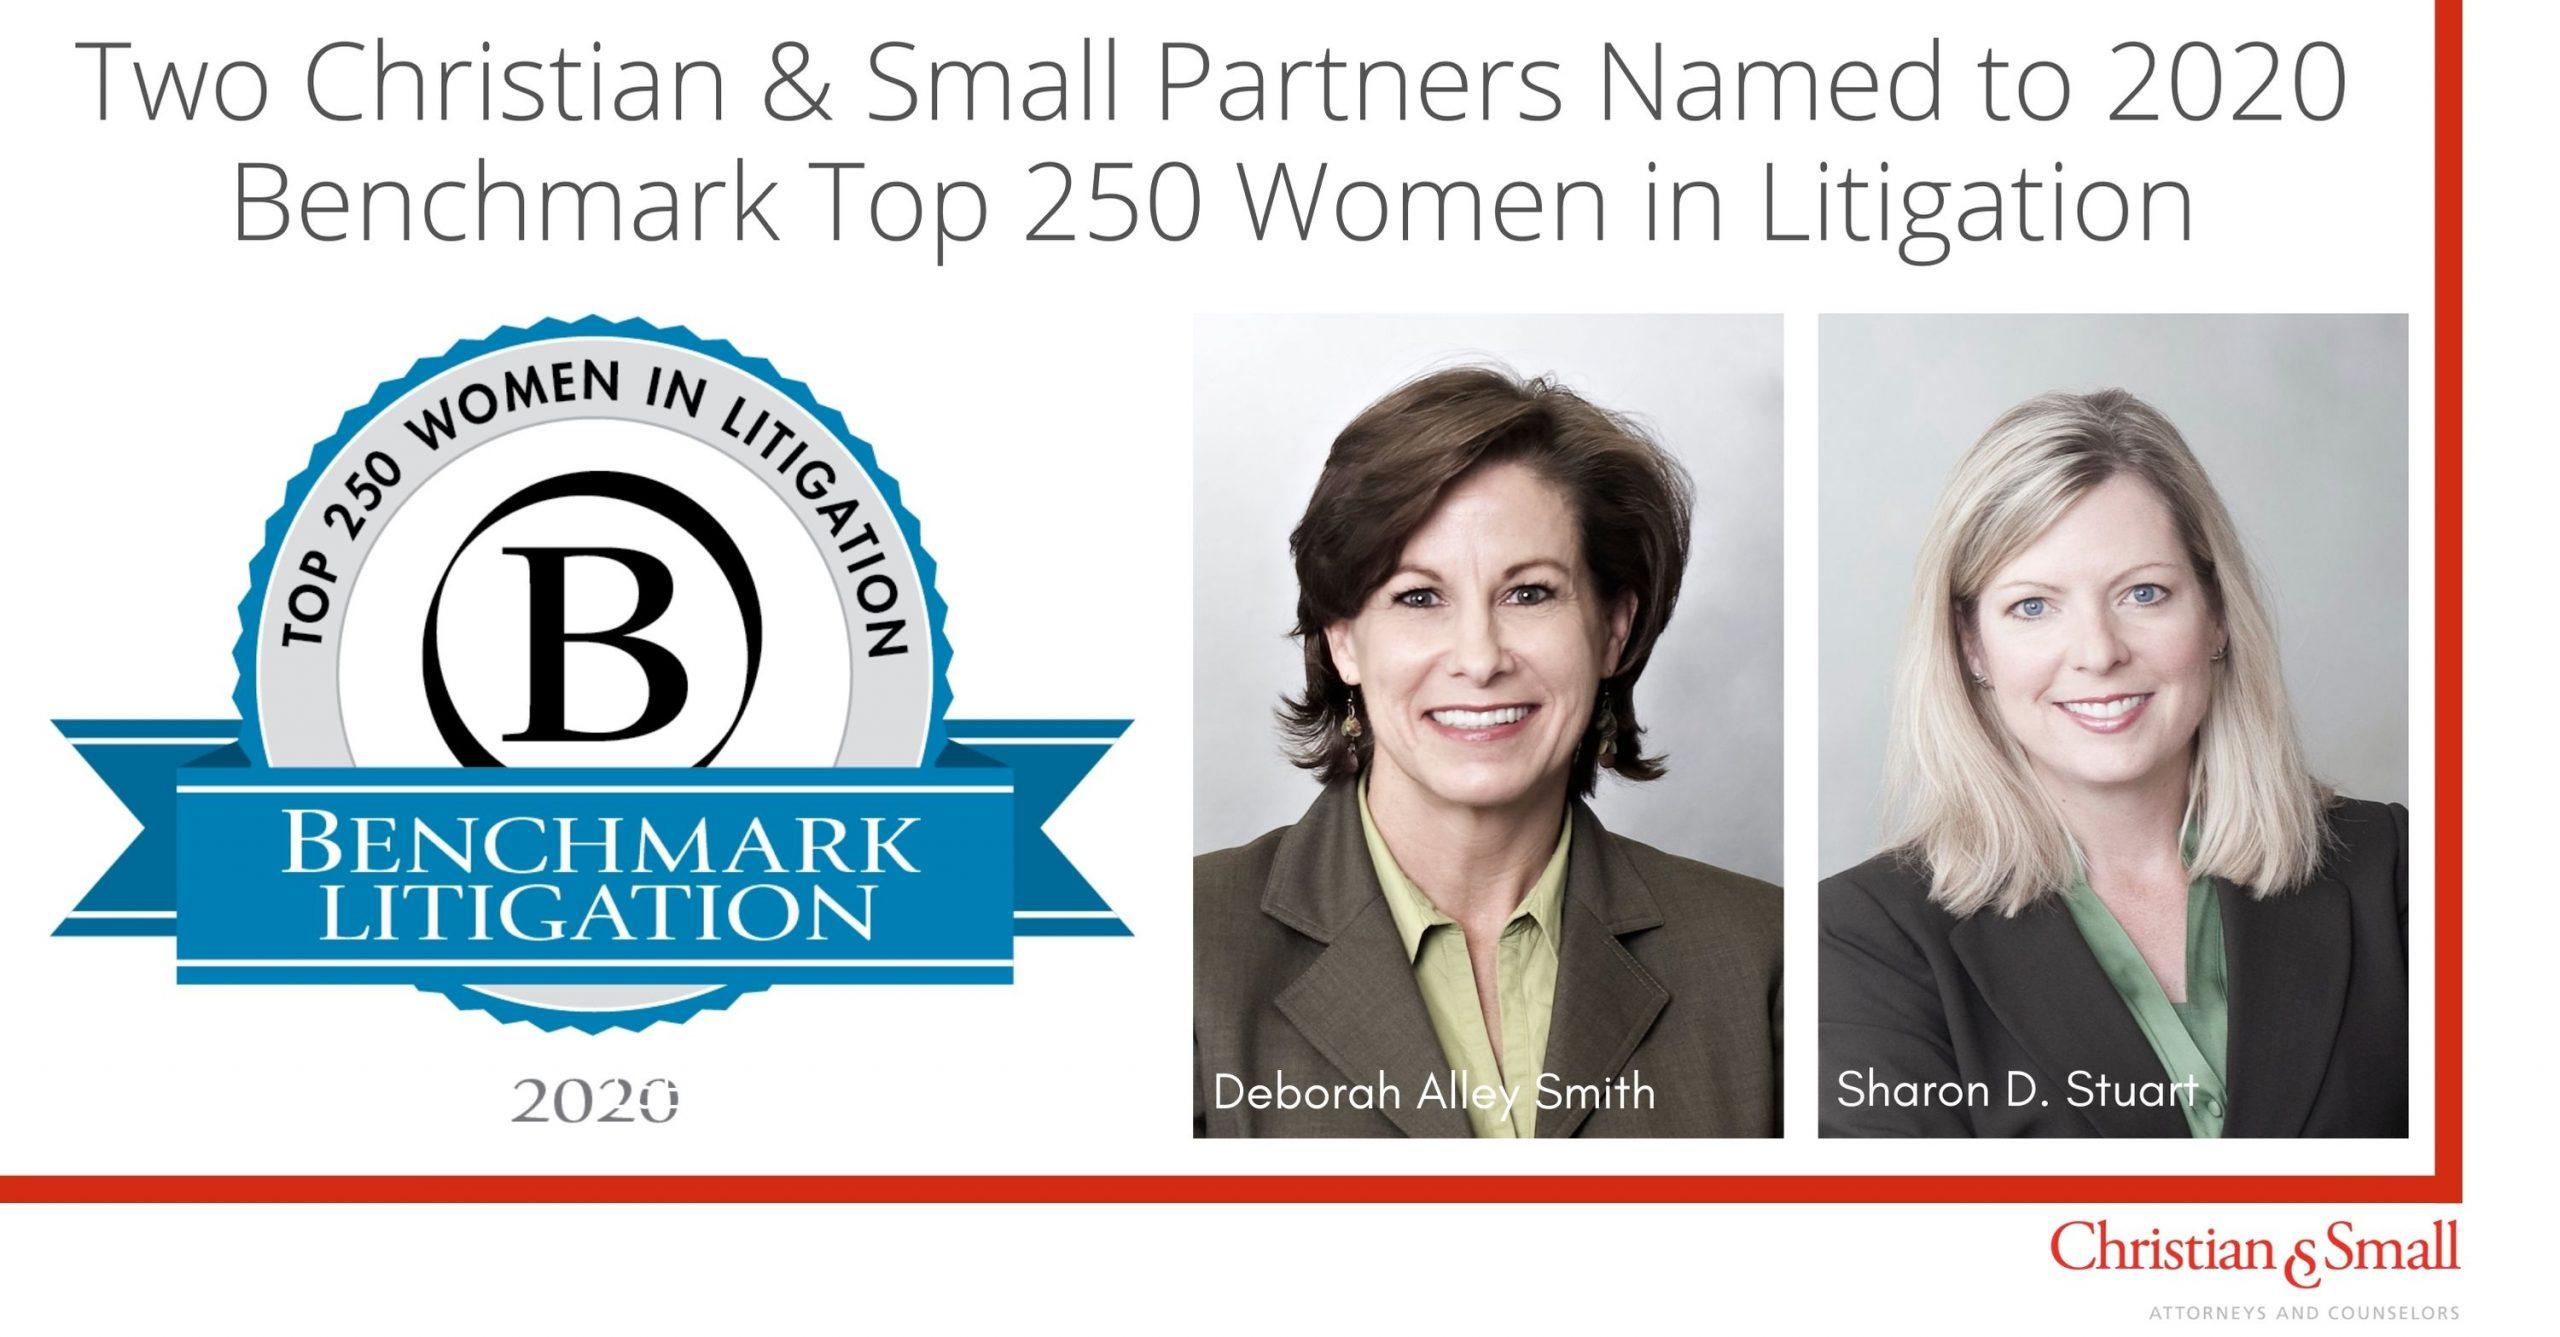 Sharon D. Stuart and Deborah Alley Smith Named to 2020 Benchmark Litigation's Top 250 Women in Litigation